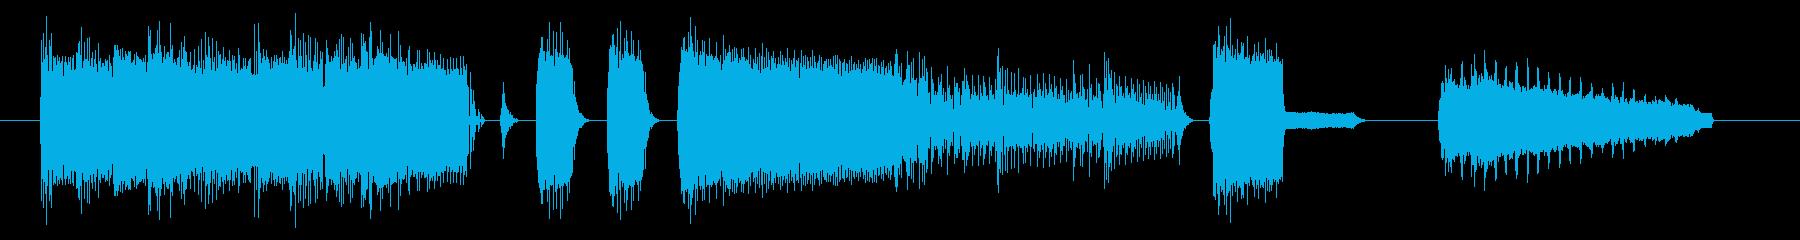 NES アクションC10-1(スタート1の再生済みの波形